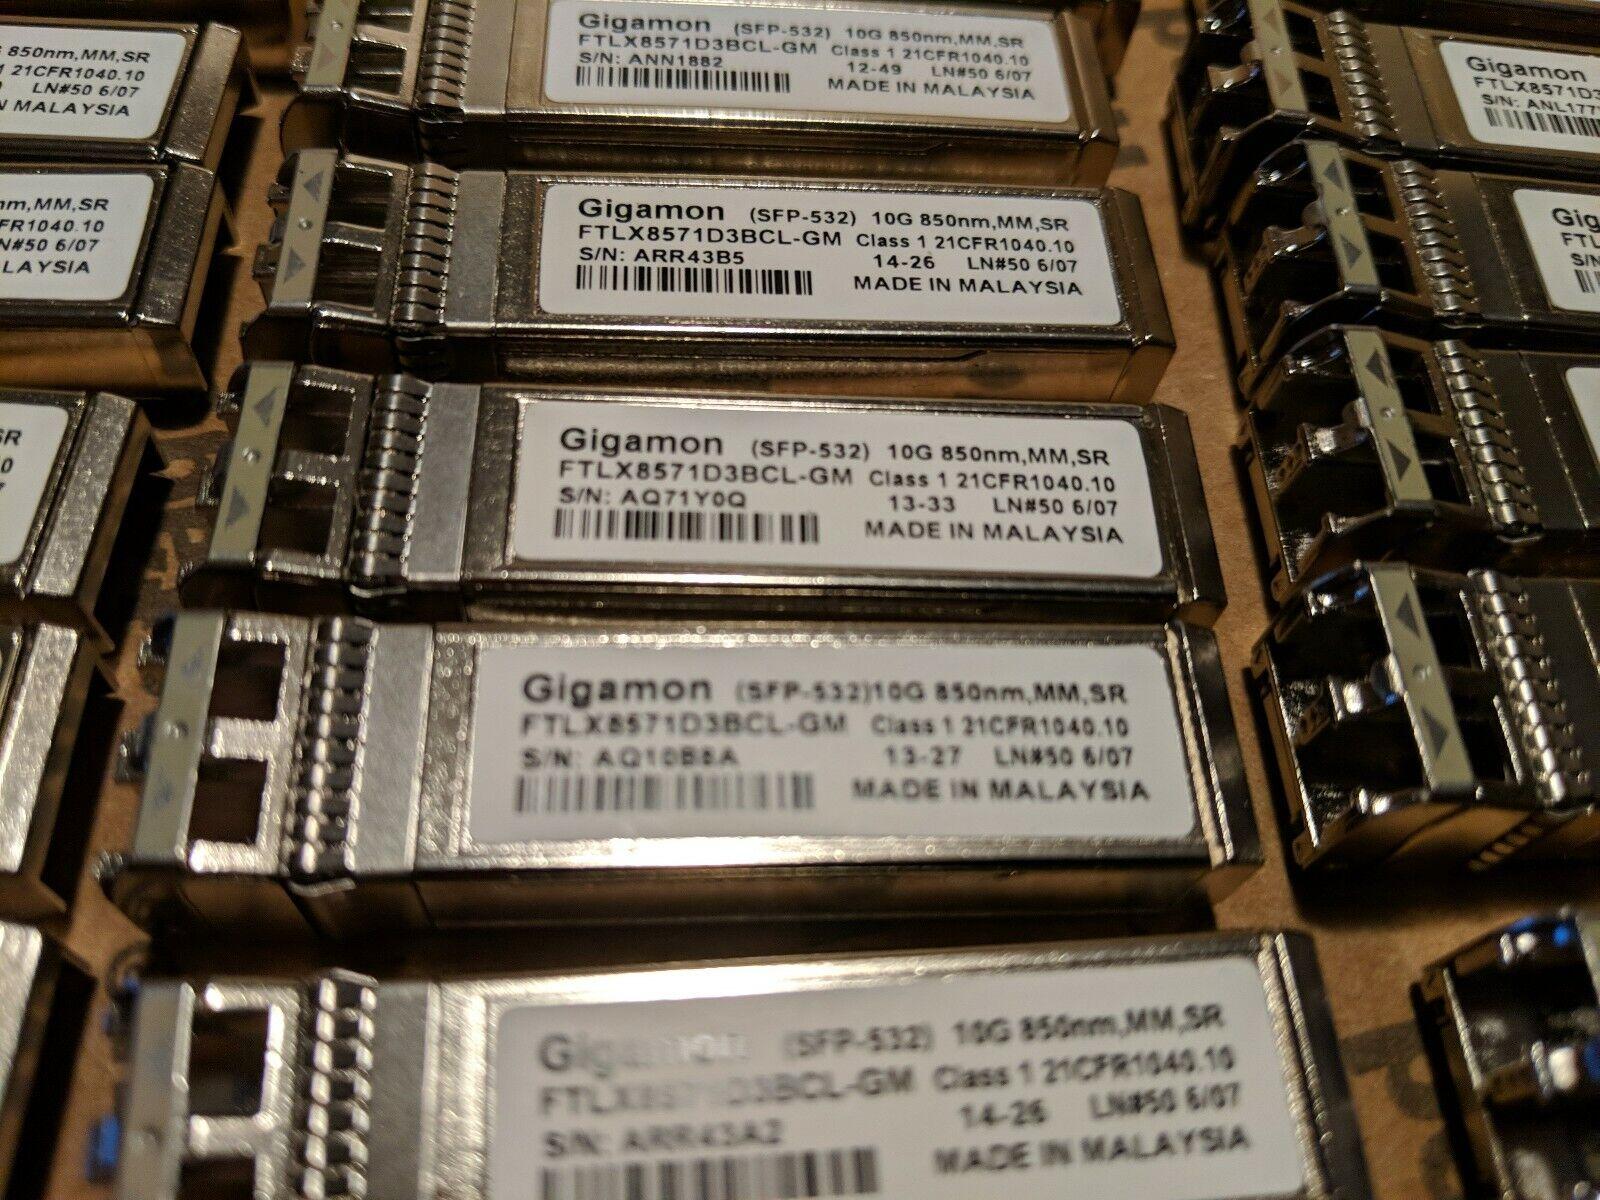 SR SFP Gigamon SFP-532 FTLX8571D3BCL-GM 10G 850nm MM transceiver w//60daysWRTY